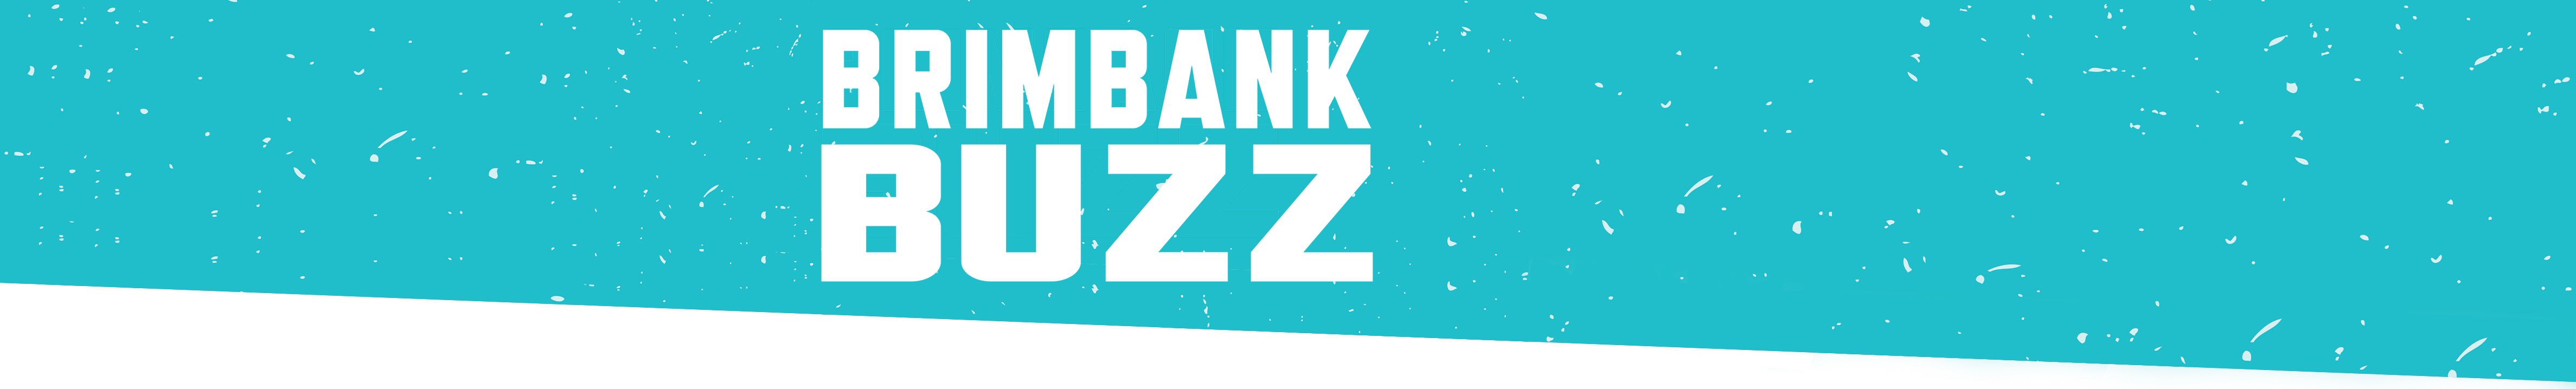 Brimbank Buzz